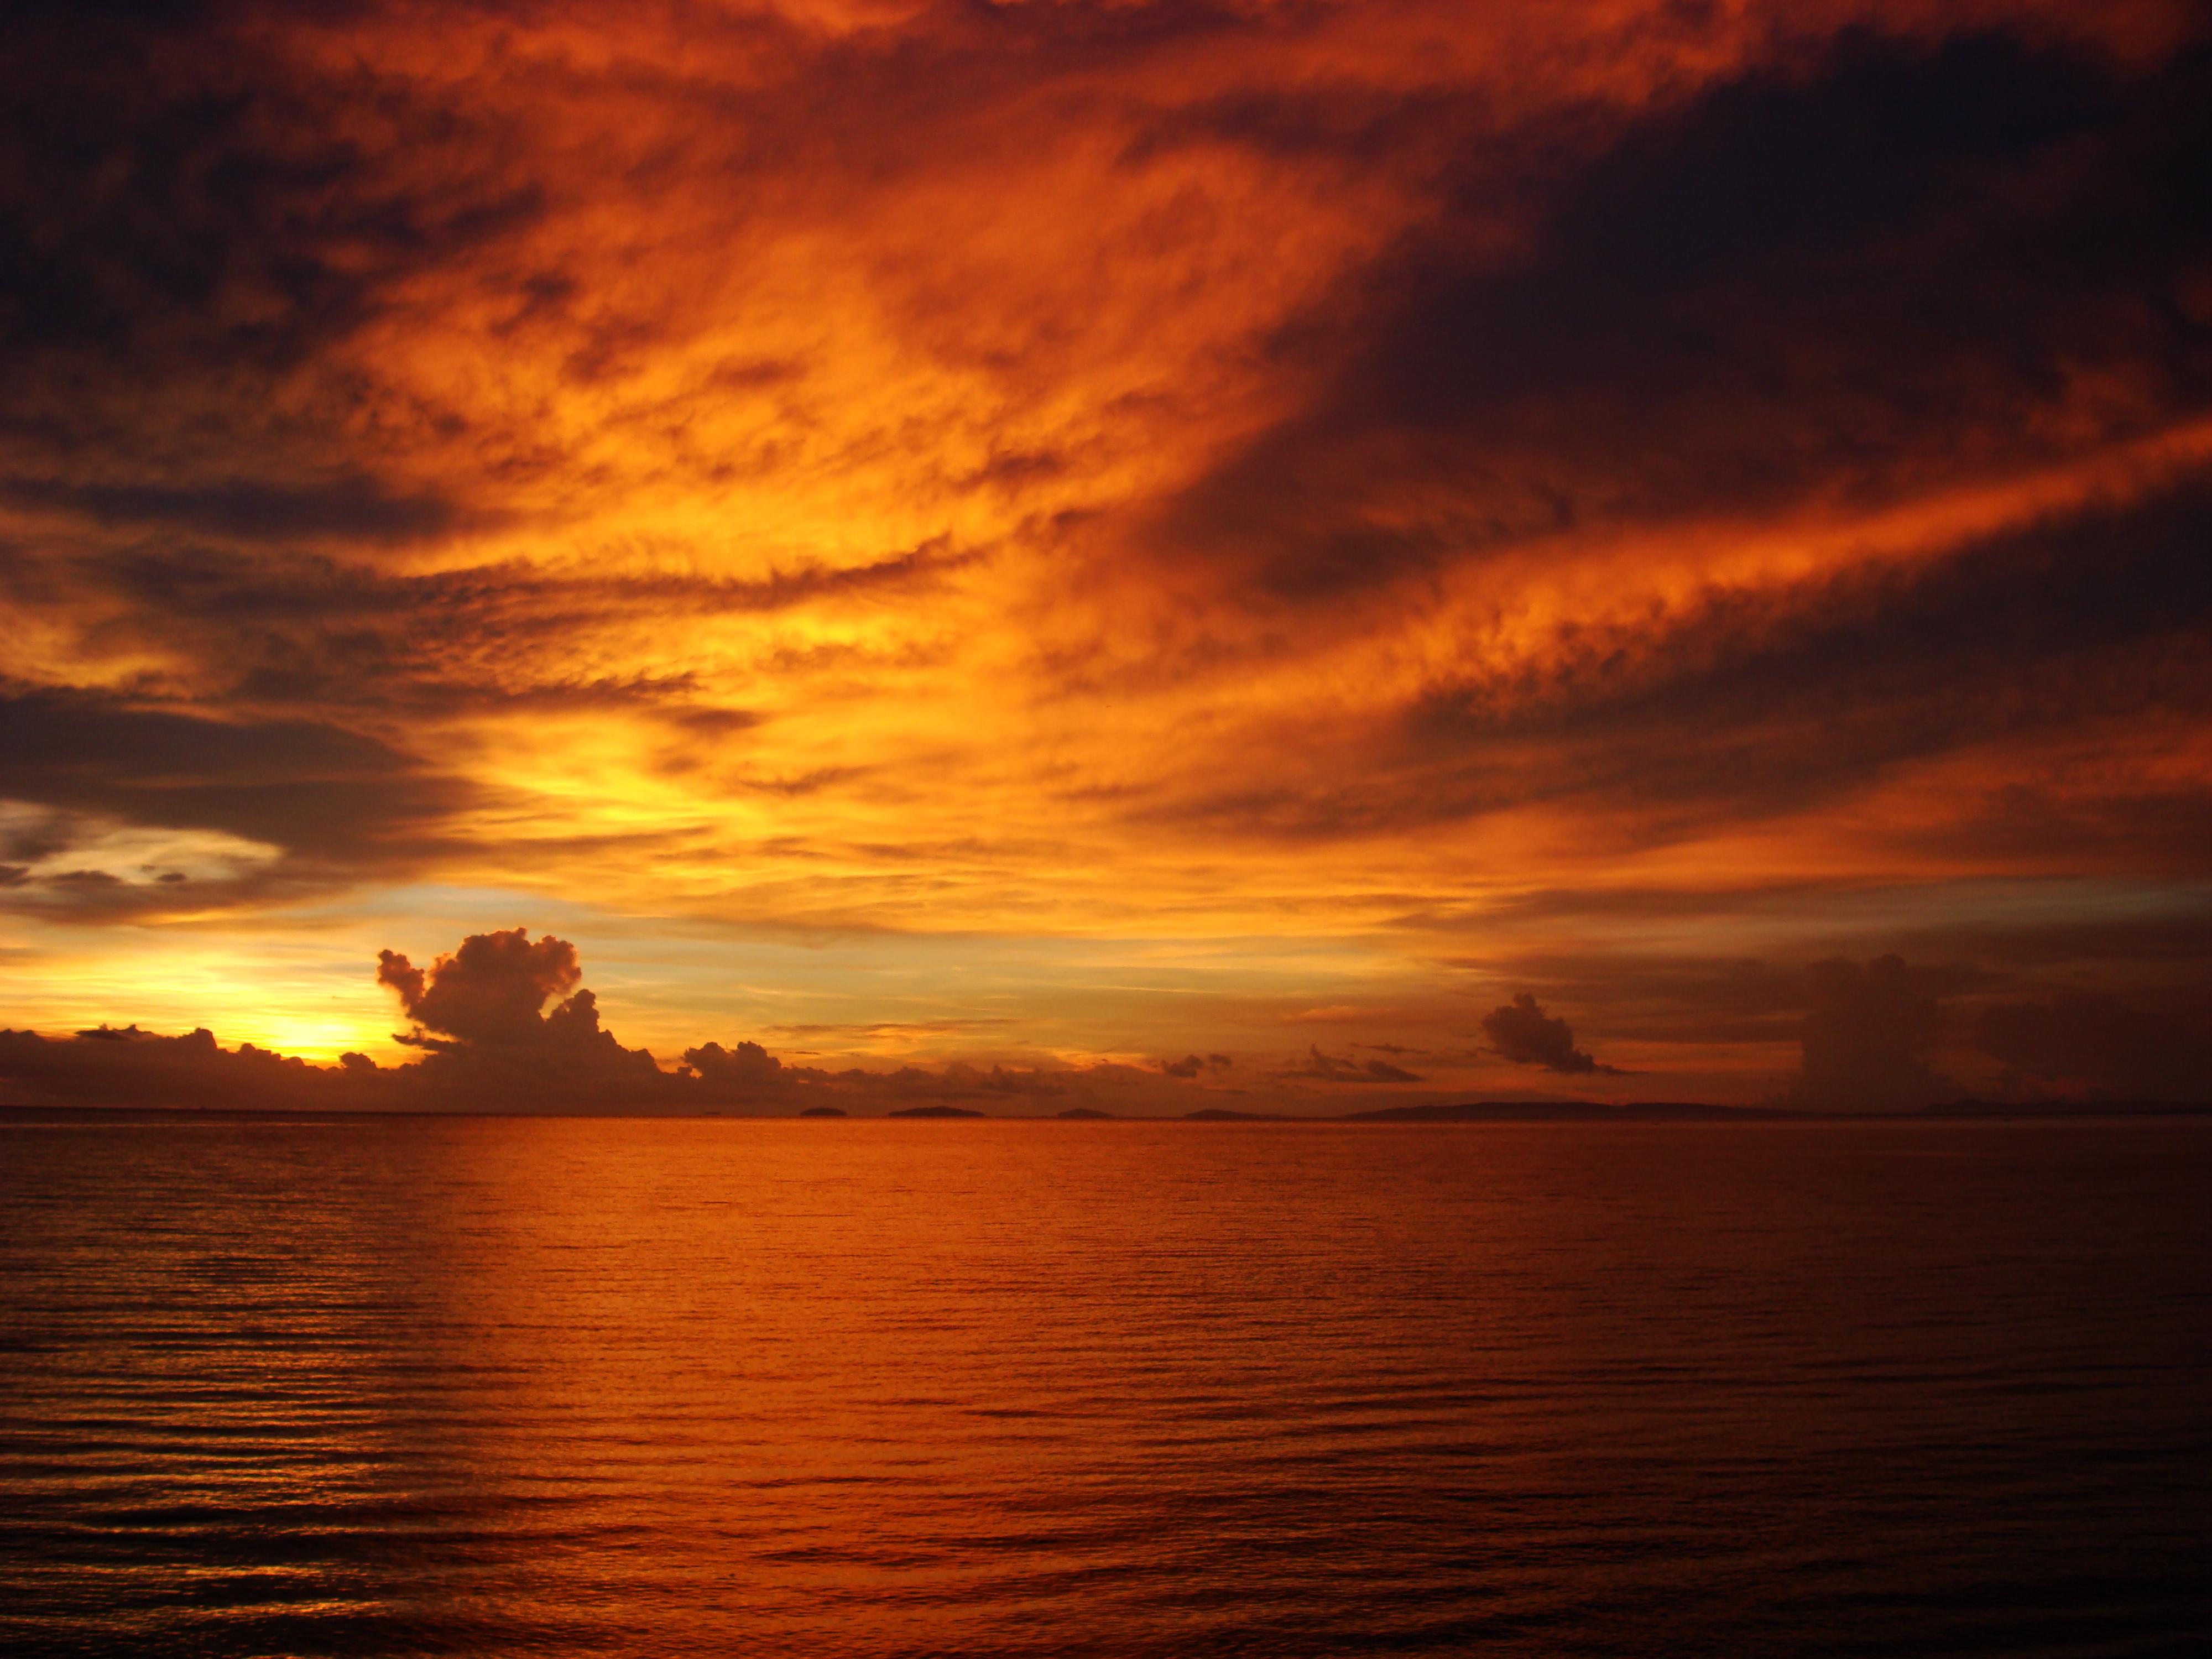 Sunrise Philippines Mindoro Island Tabinay 22